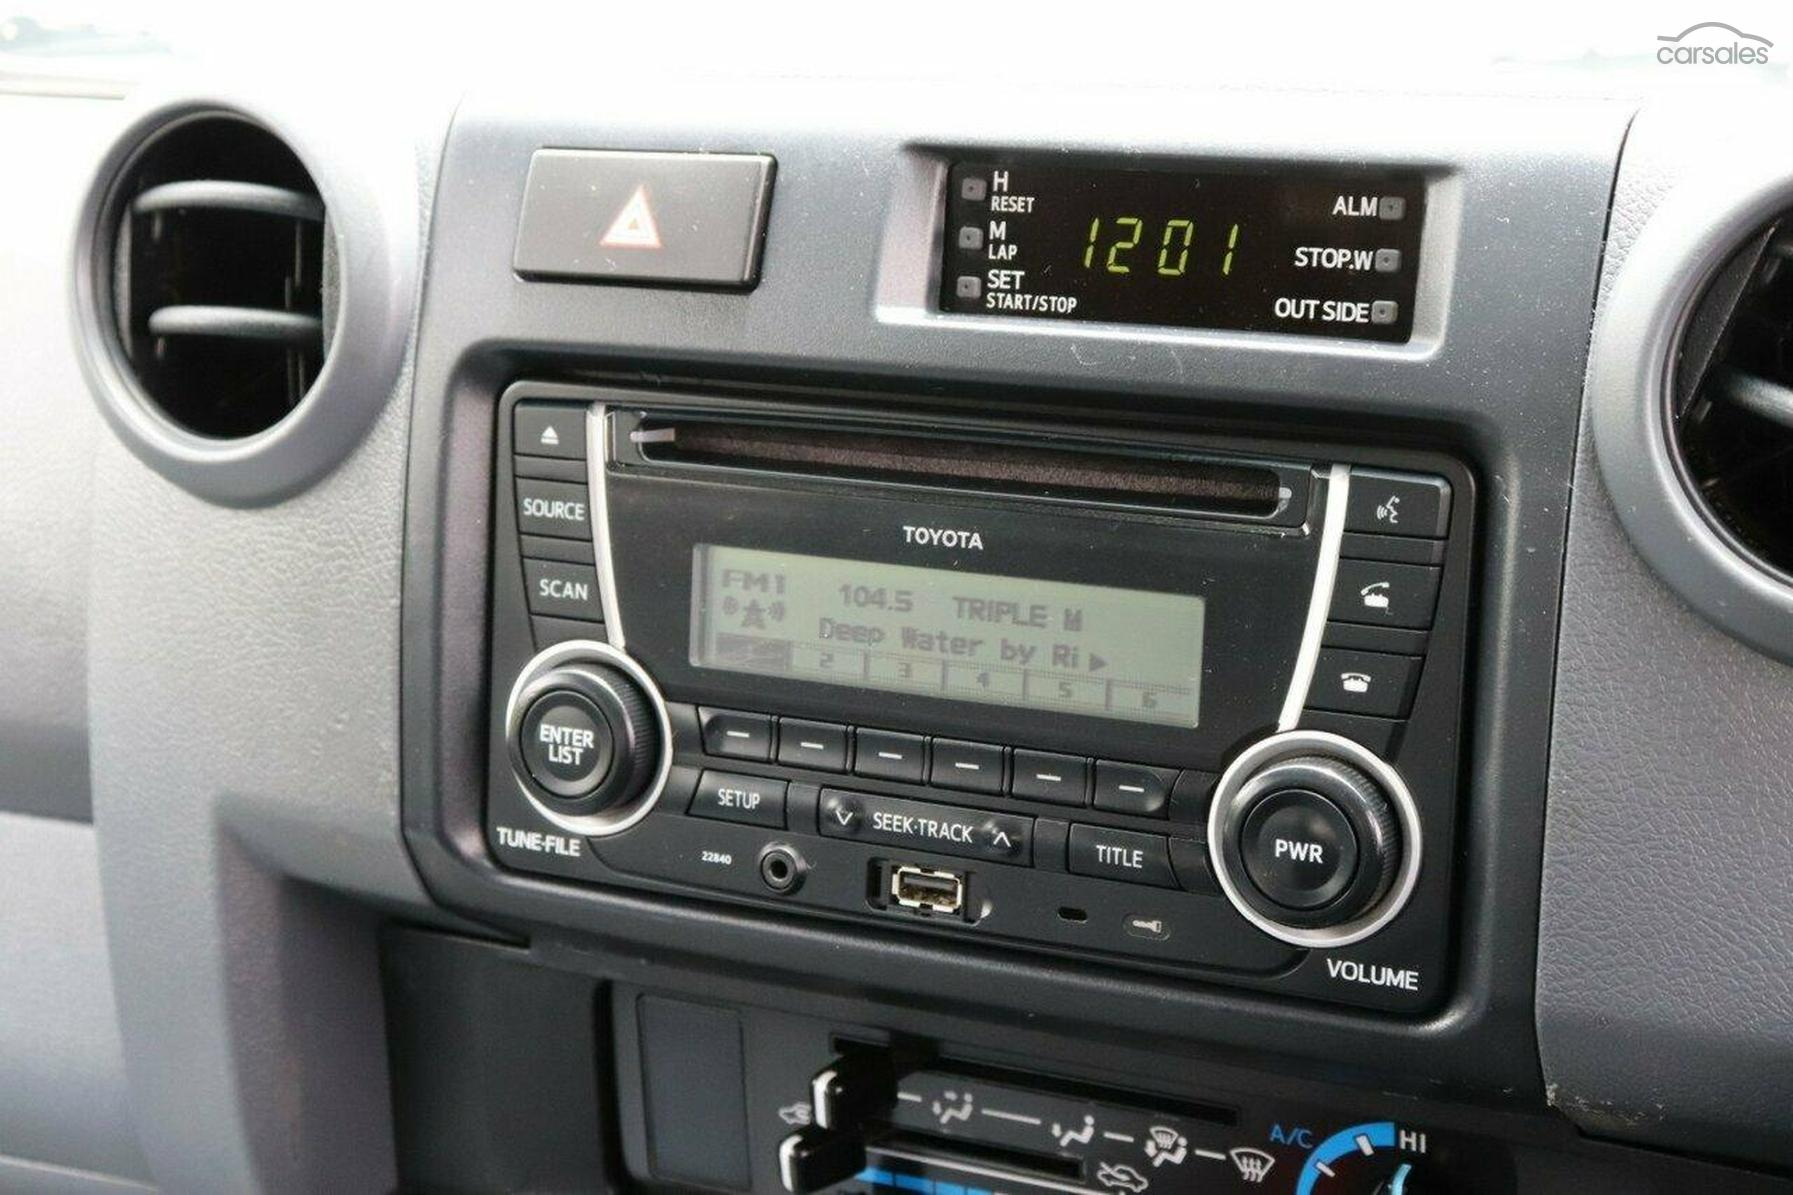 2015 Toyota Landcruiser GXL Troopcarrier Manual 4x4-OAG-AD